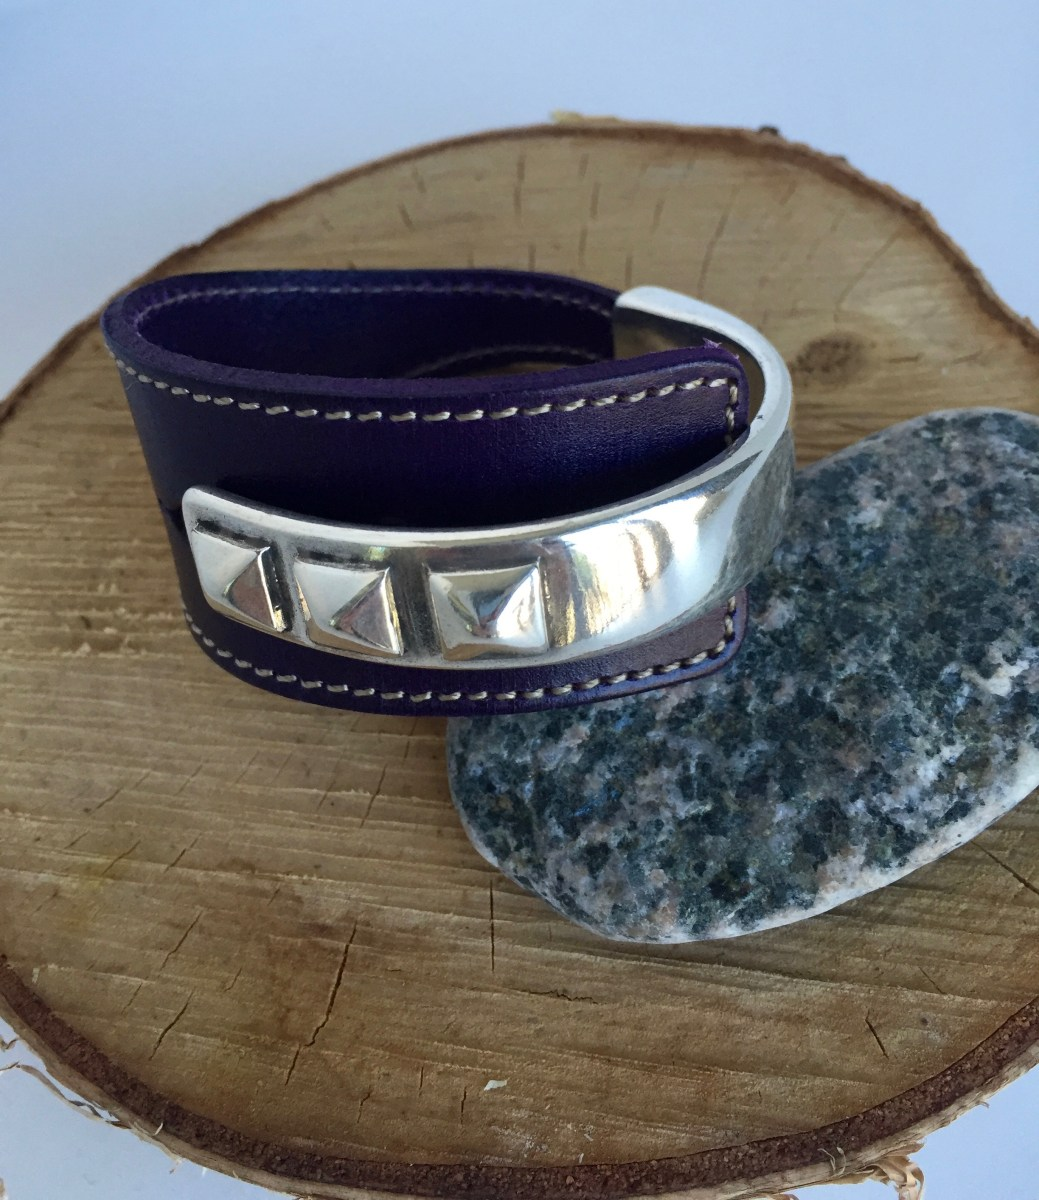 Rich Plum Wide Leather Silver Rivet Cuff Bracelet